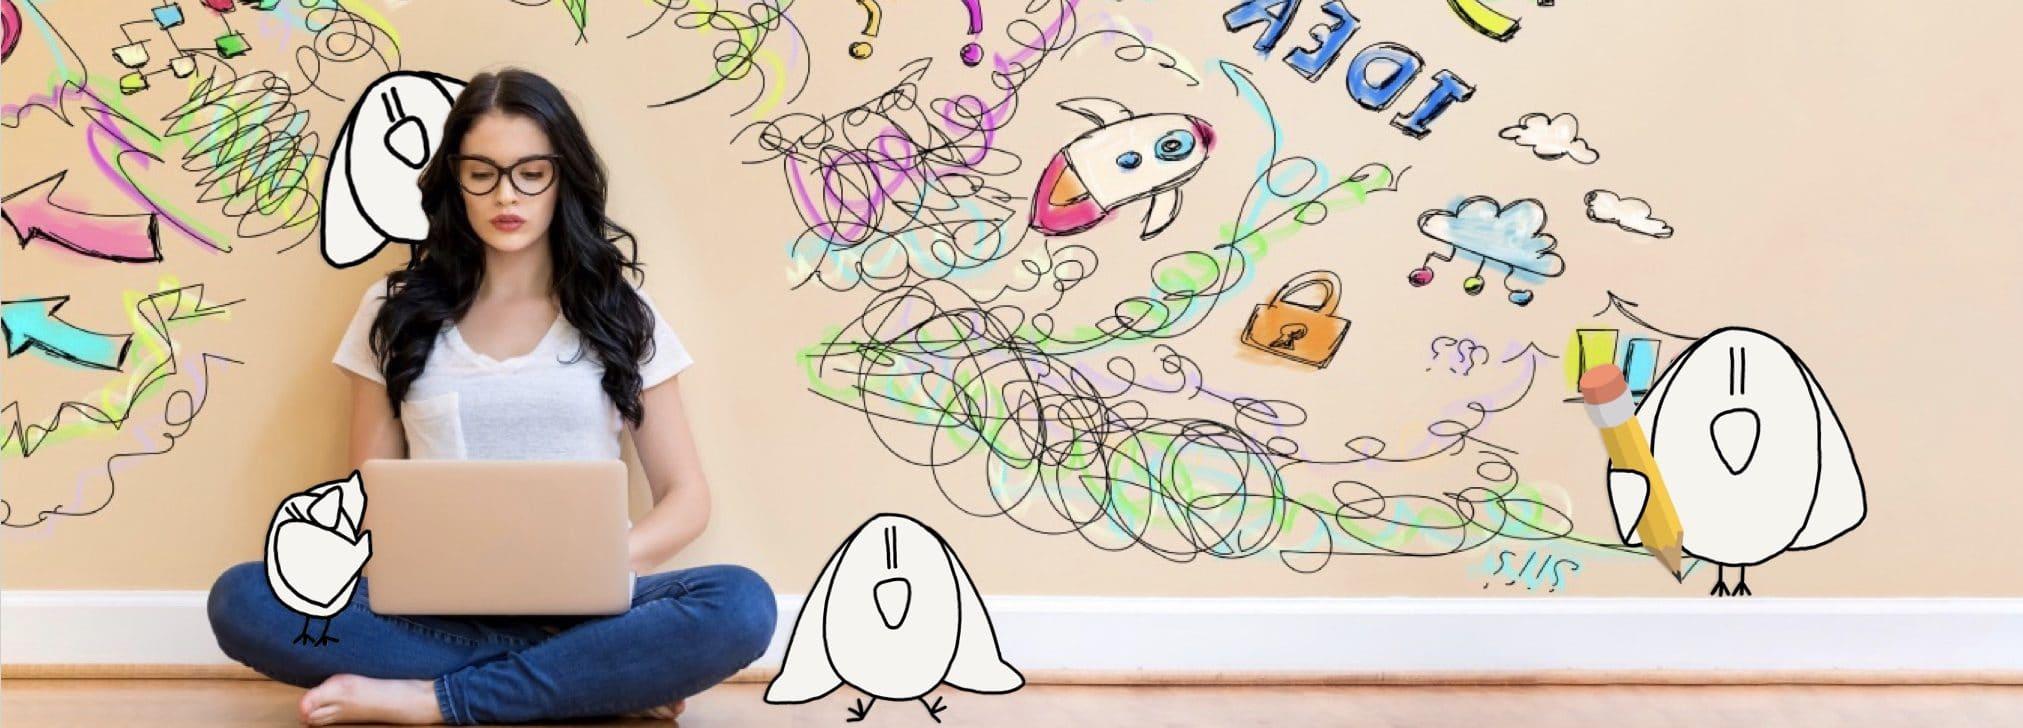 iBird wall doodle